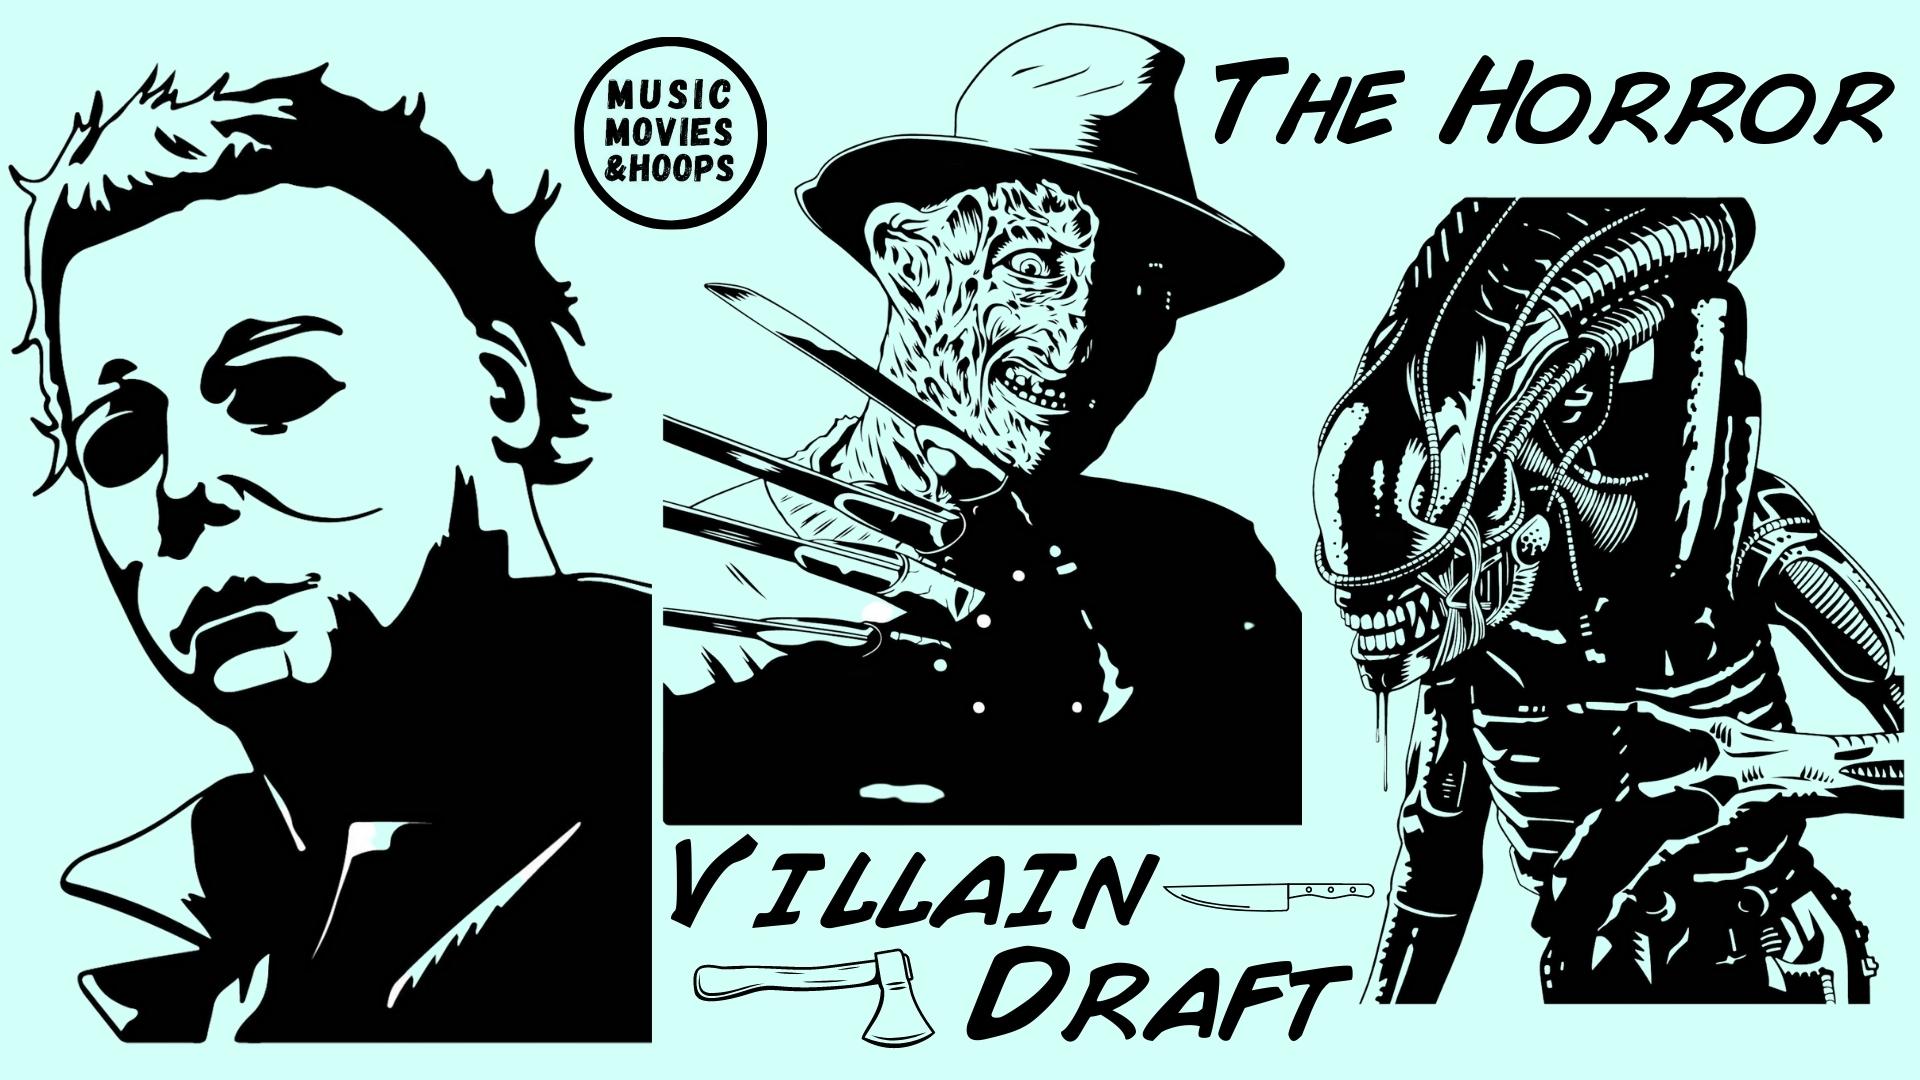 MMH Fantasy Drafts | Horror Villains Battle Royale